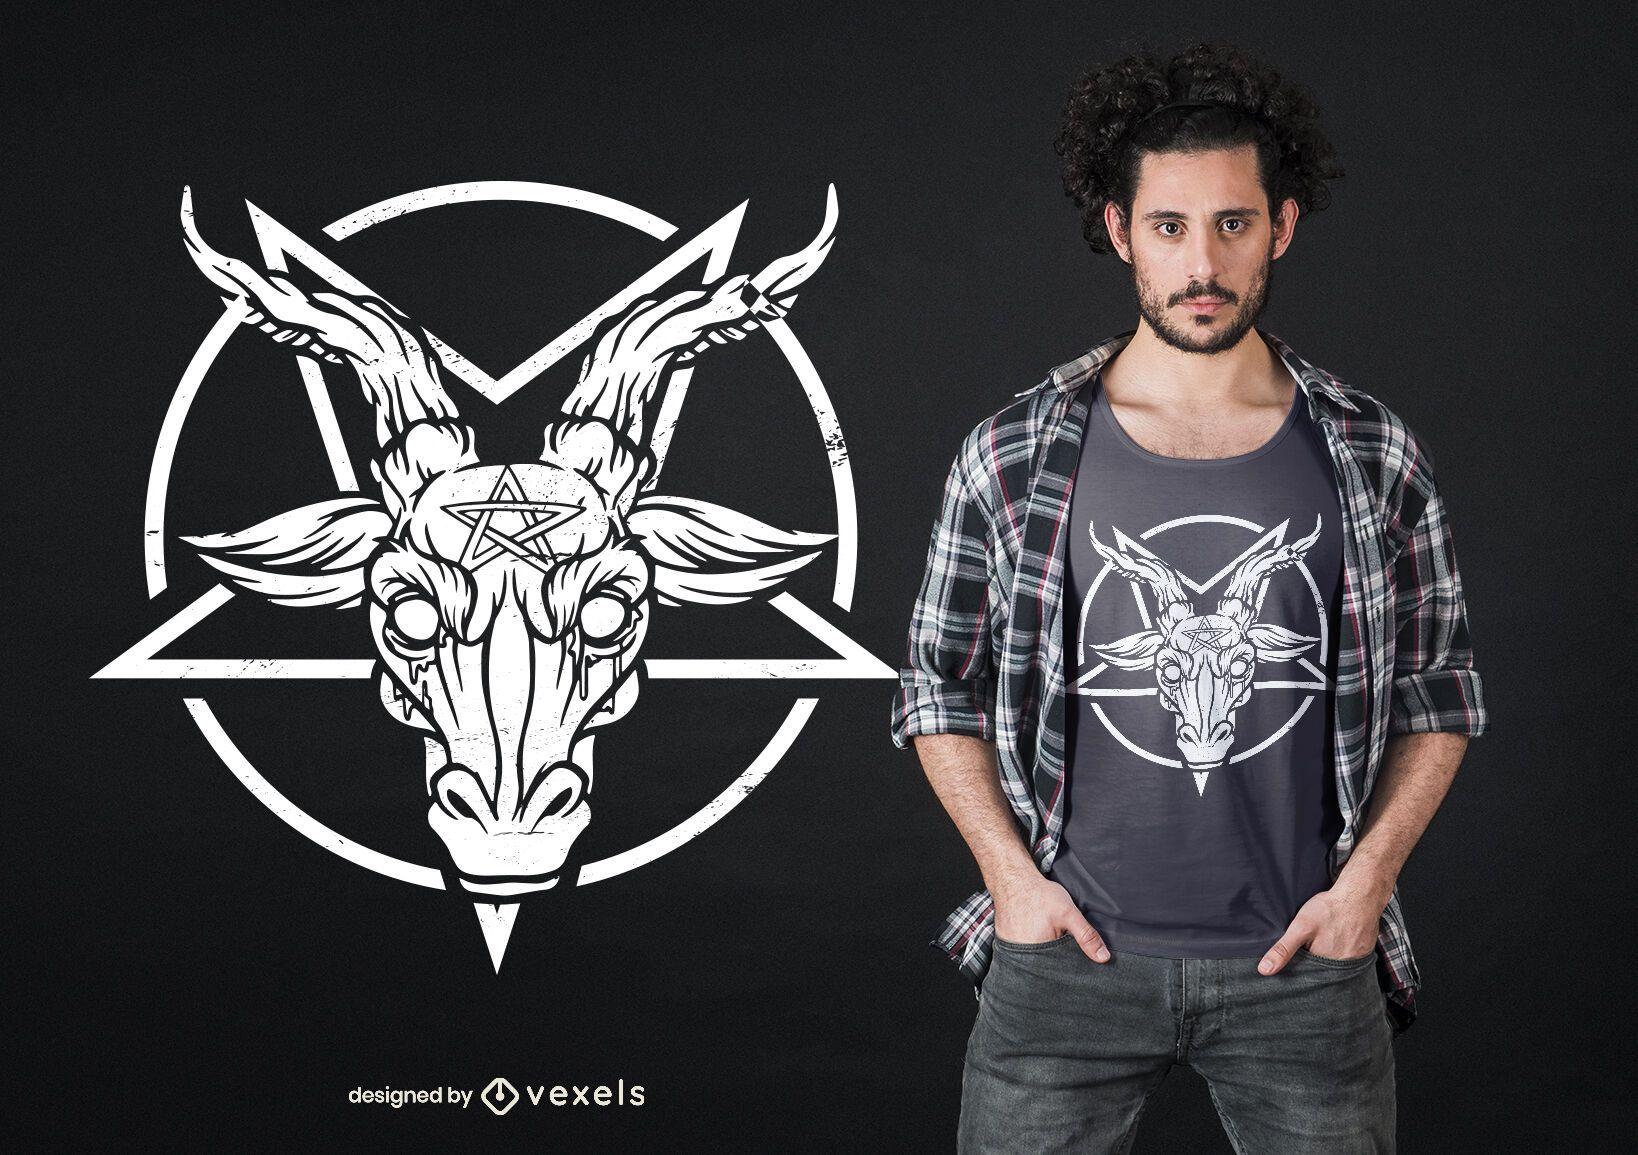 Baphomet pentagram t-shirt design